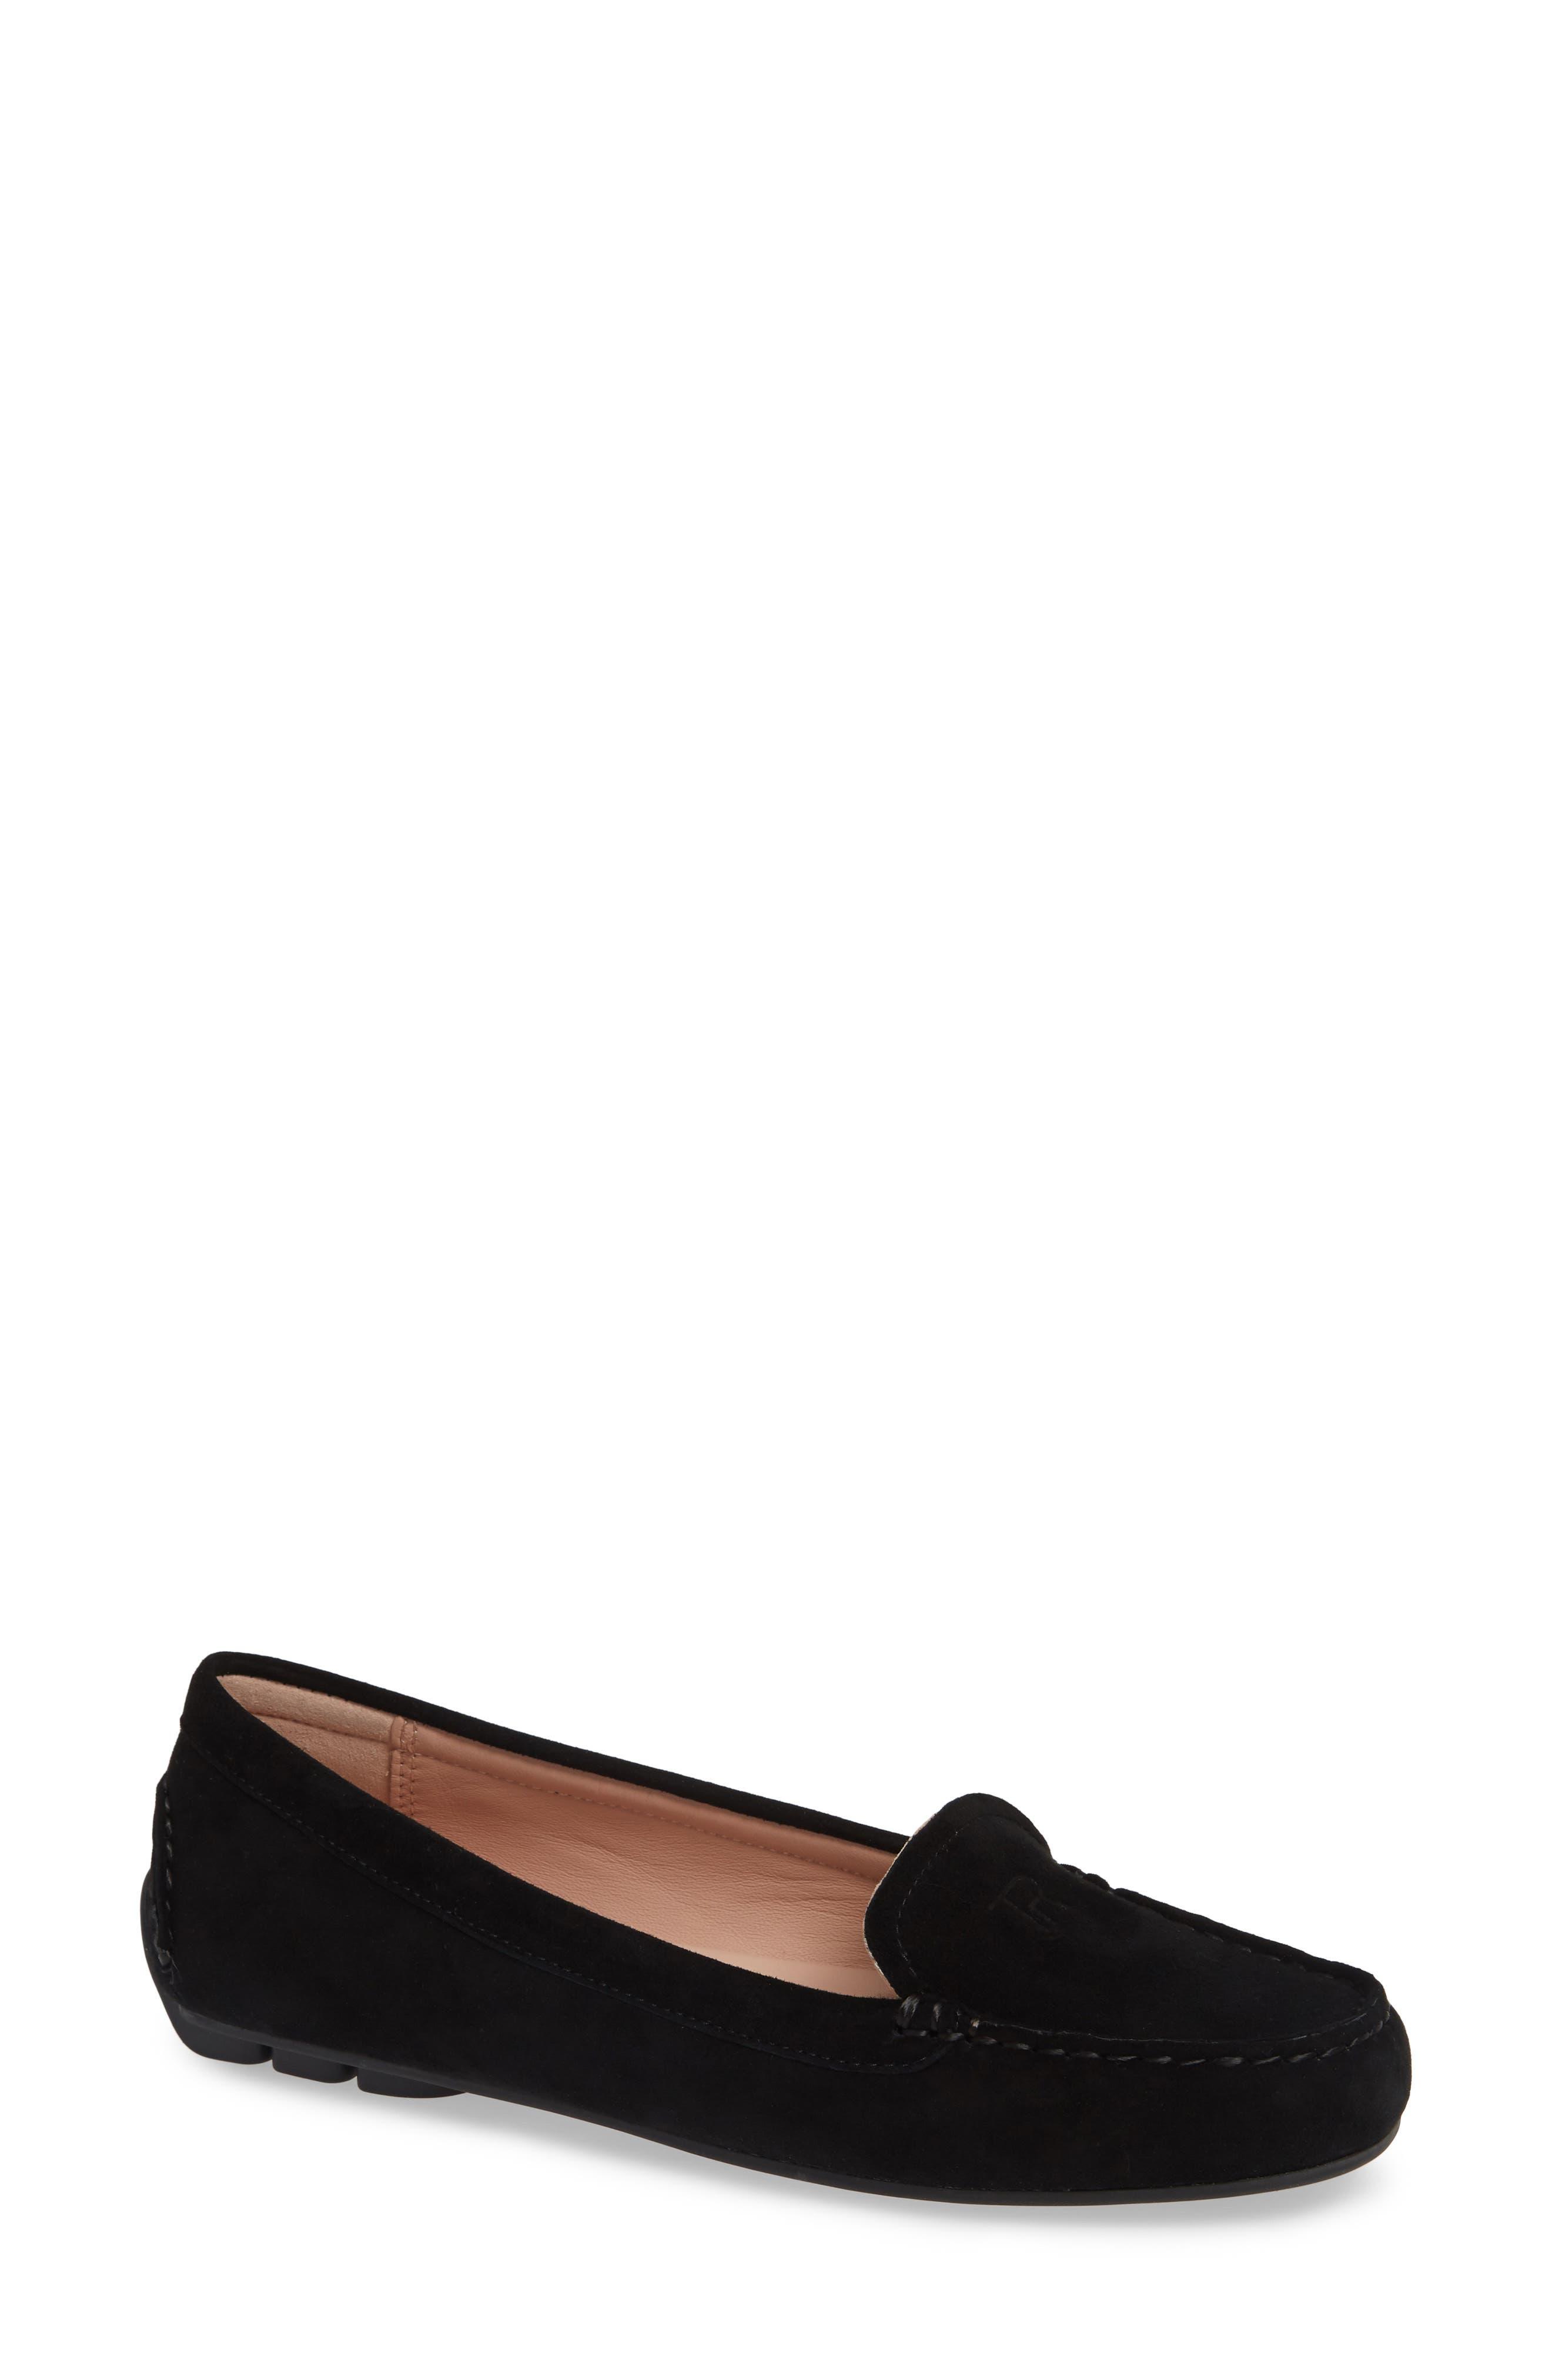 TARYN ROSE, Karen Water Resistant Driving Loafer, Main thumbnail 1, color, BLACK SUEDE